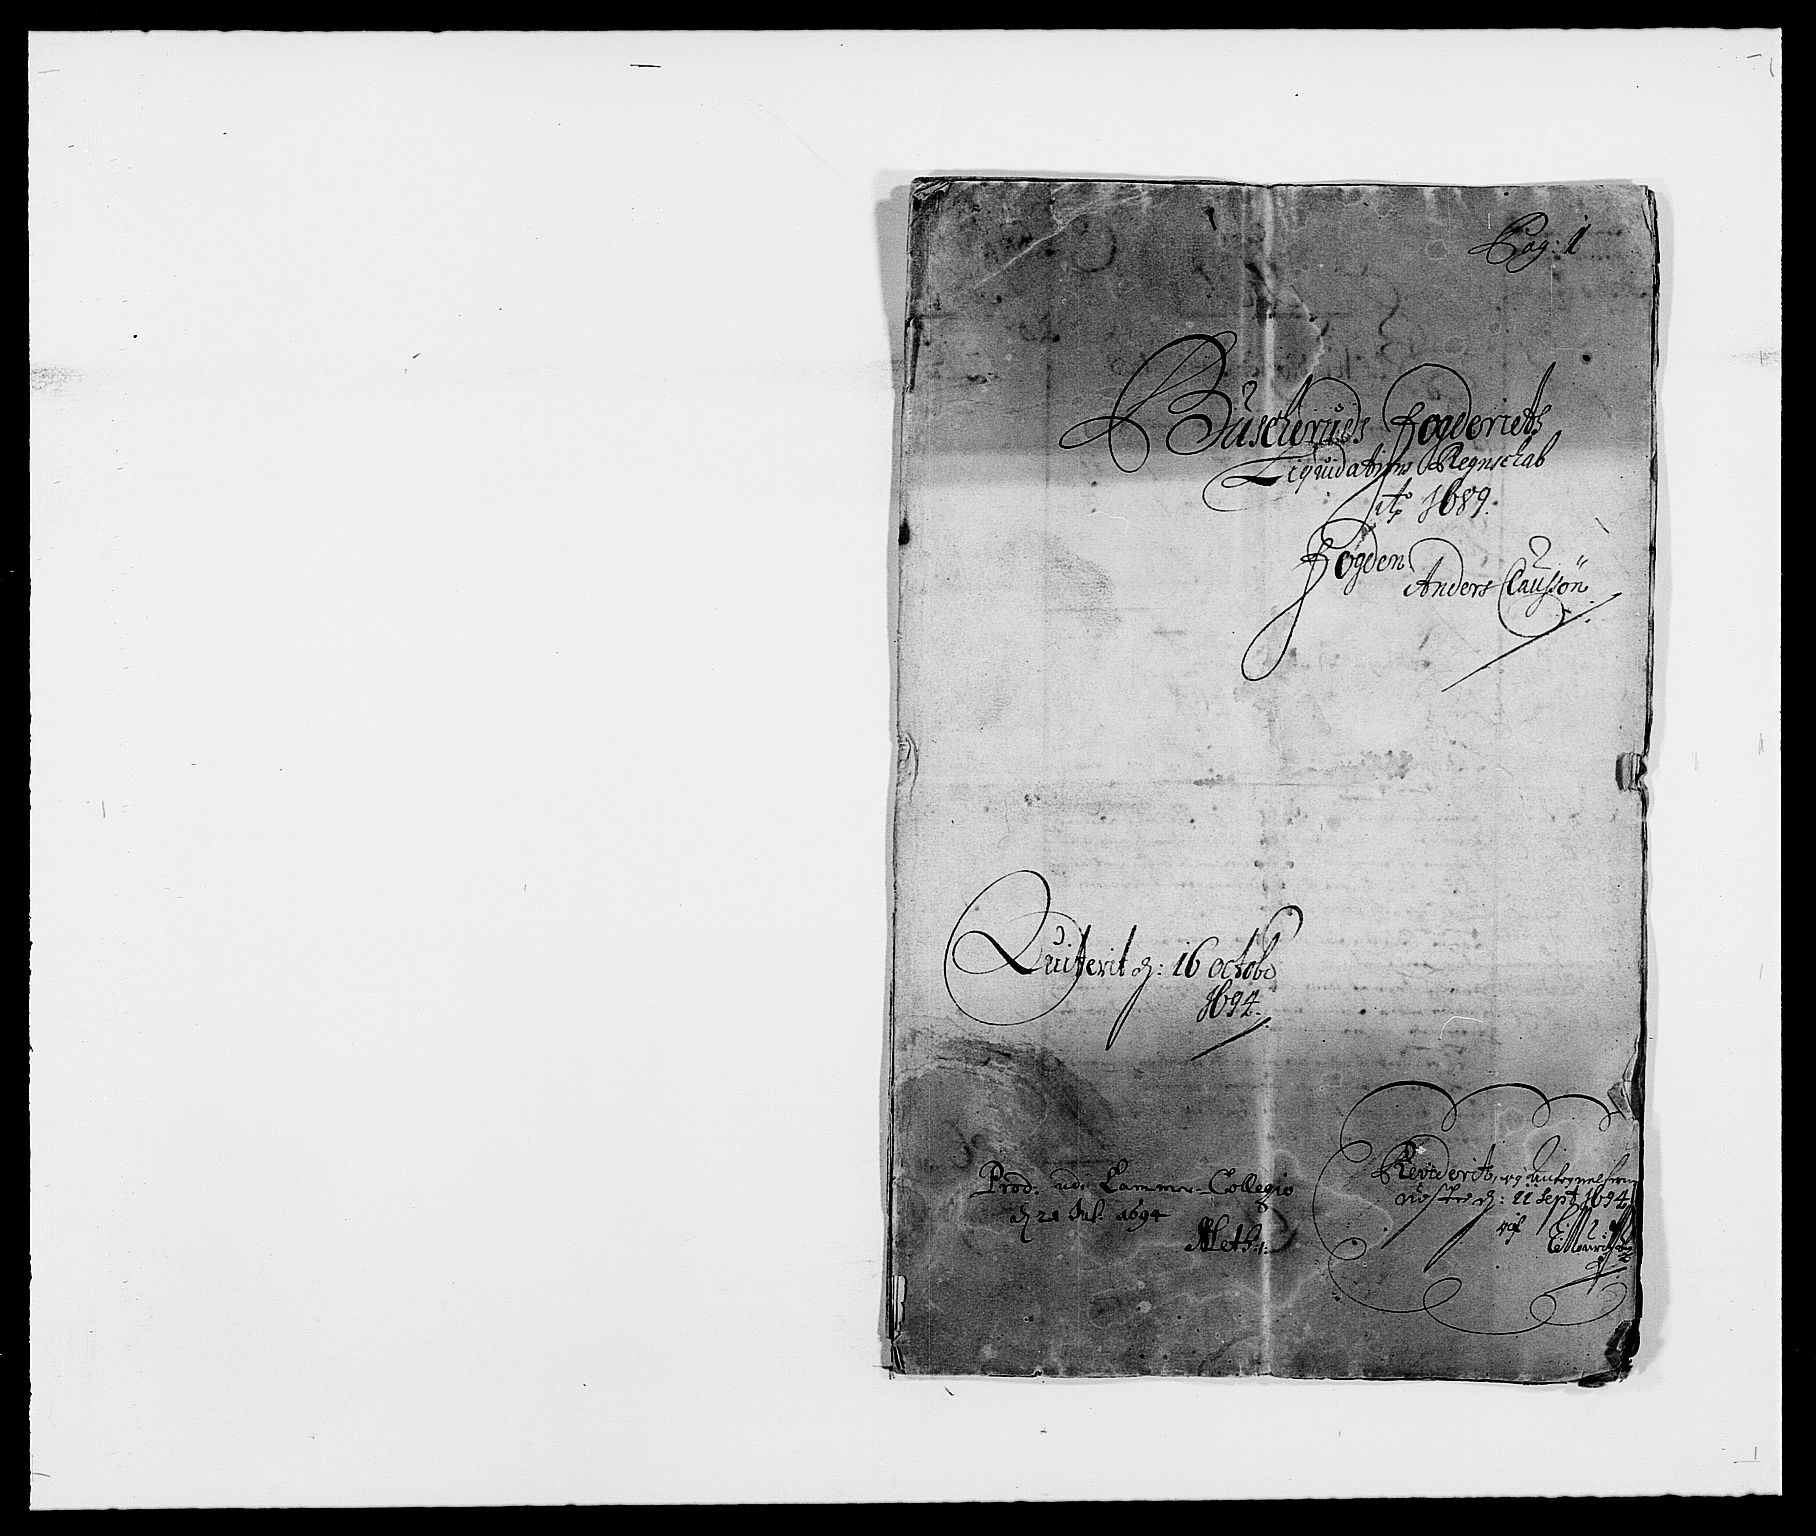 RA, Rentekammeret inntil 1814, Reviderte regnskaper, Fogderegnskap, R25/L1680: Fogderegnskap Buskerud, 1689-1690, s. 2